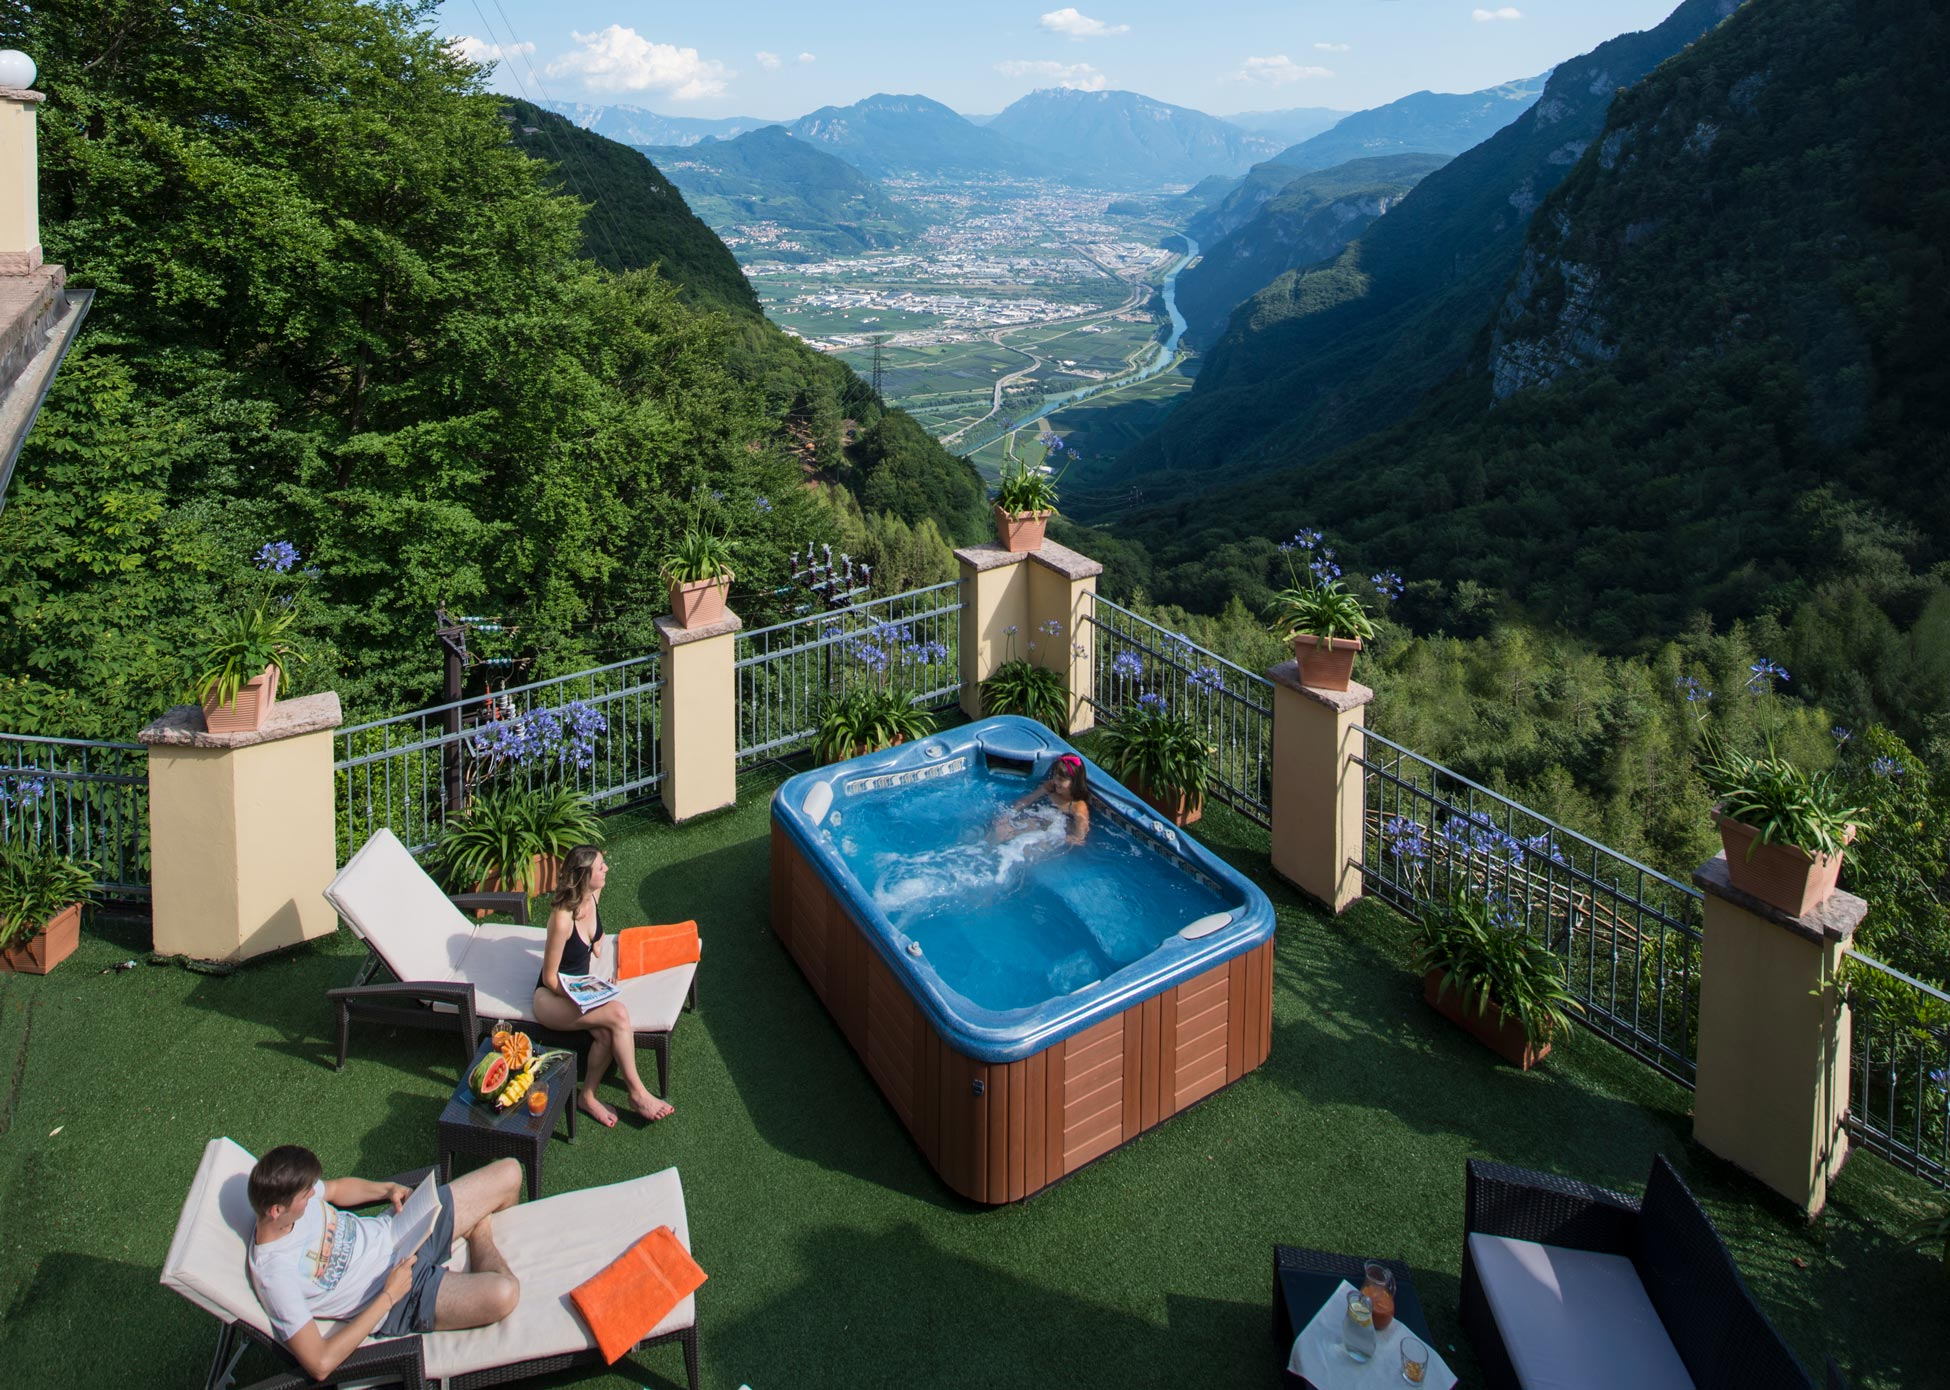 Hotel_miravalle_Albergo08-1